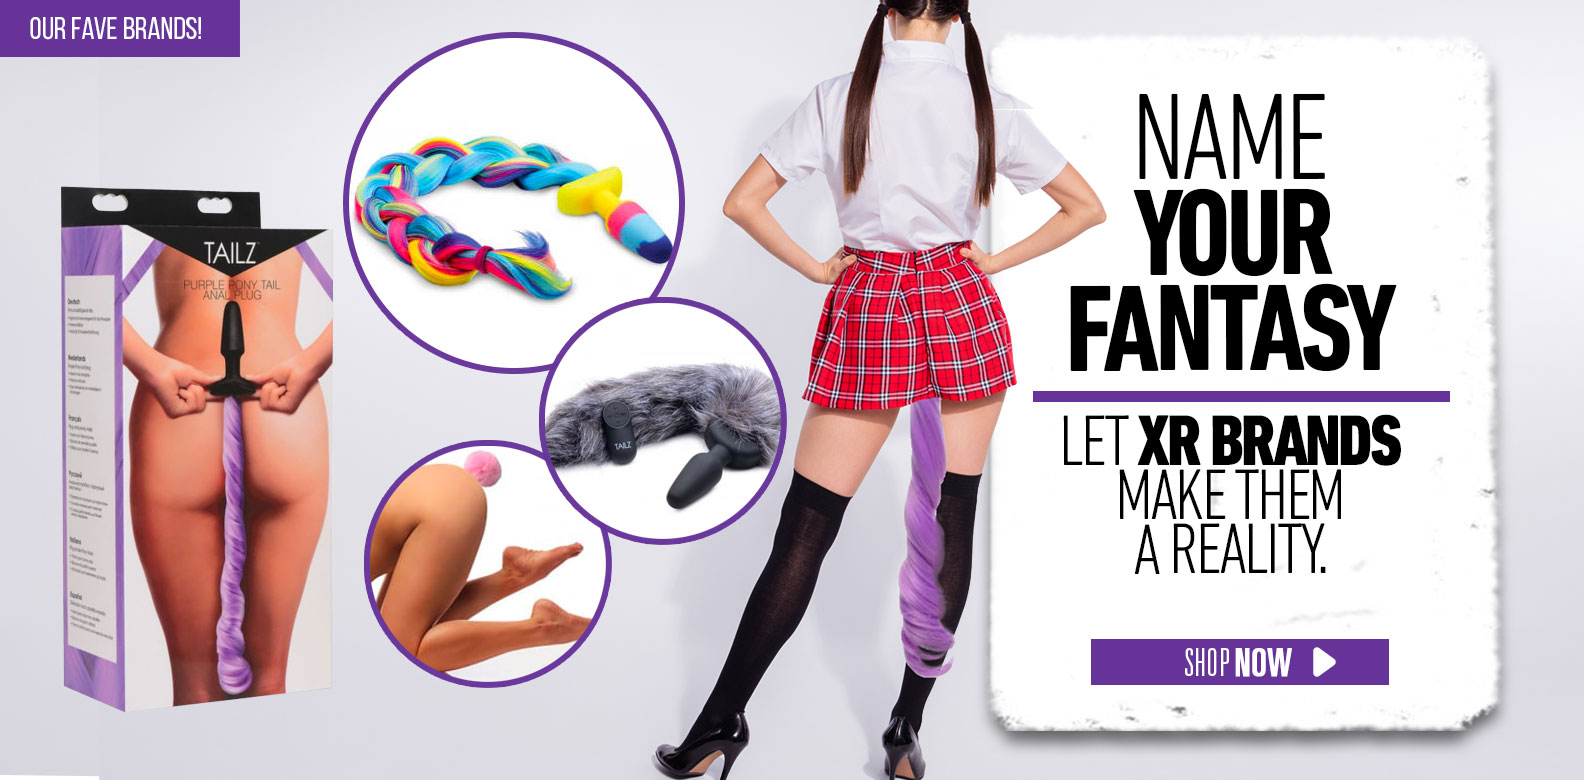 Name Your Fantasy - XR Brands